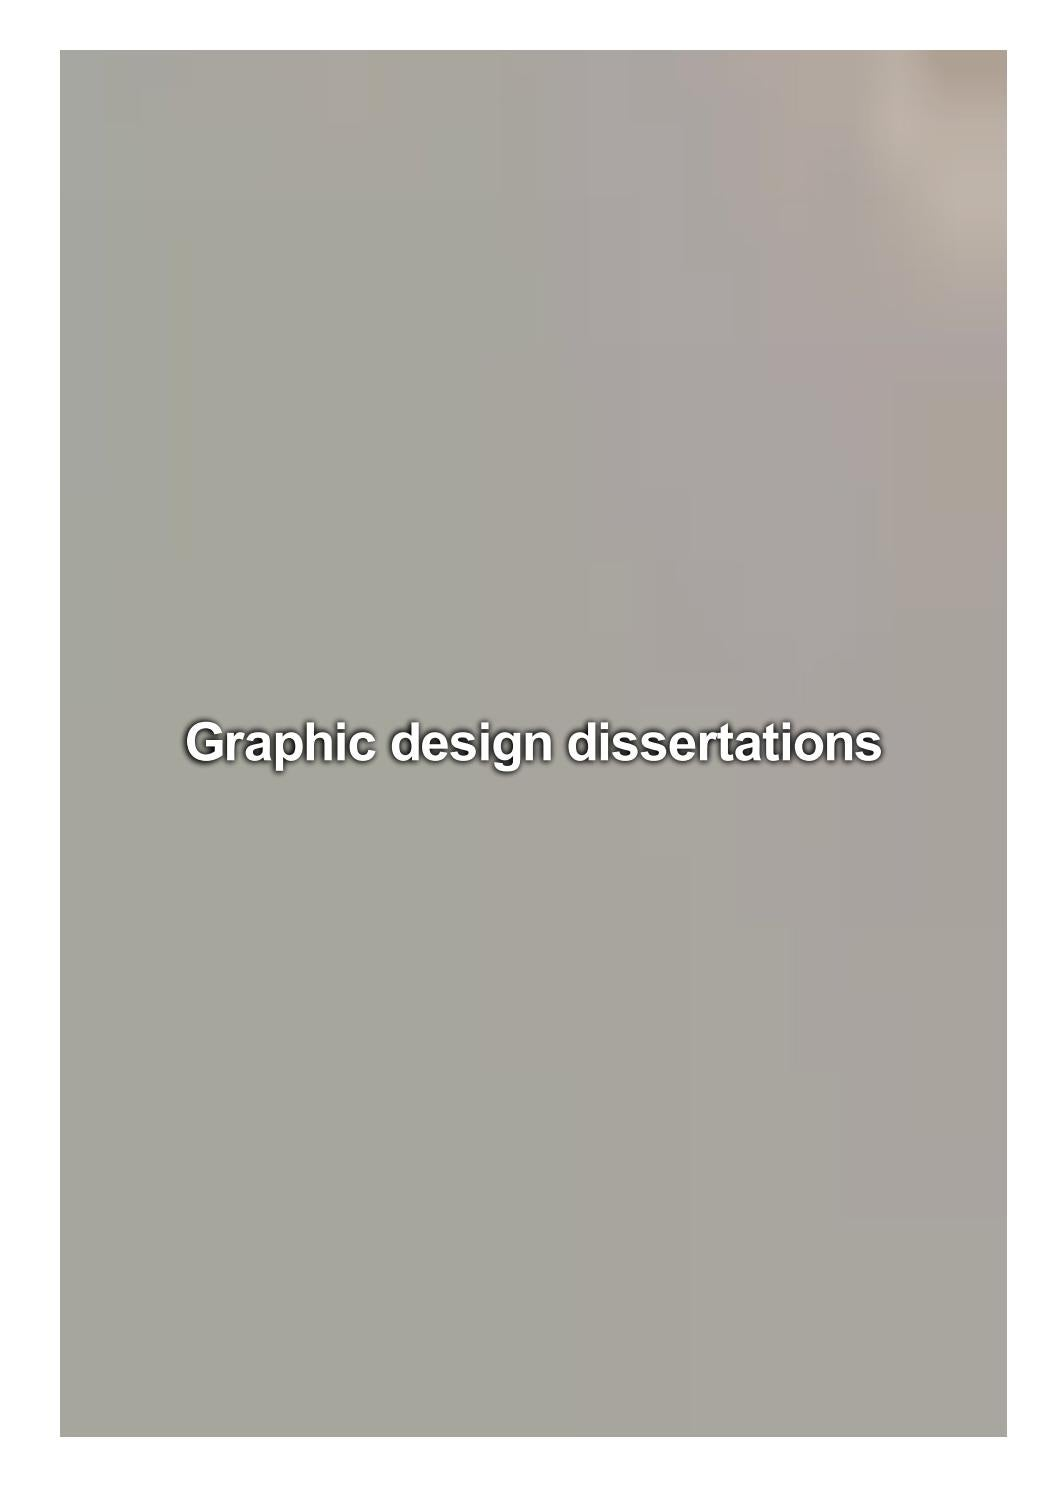 Graphic design dissertations write term paper